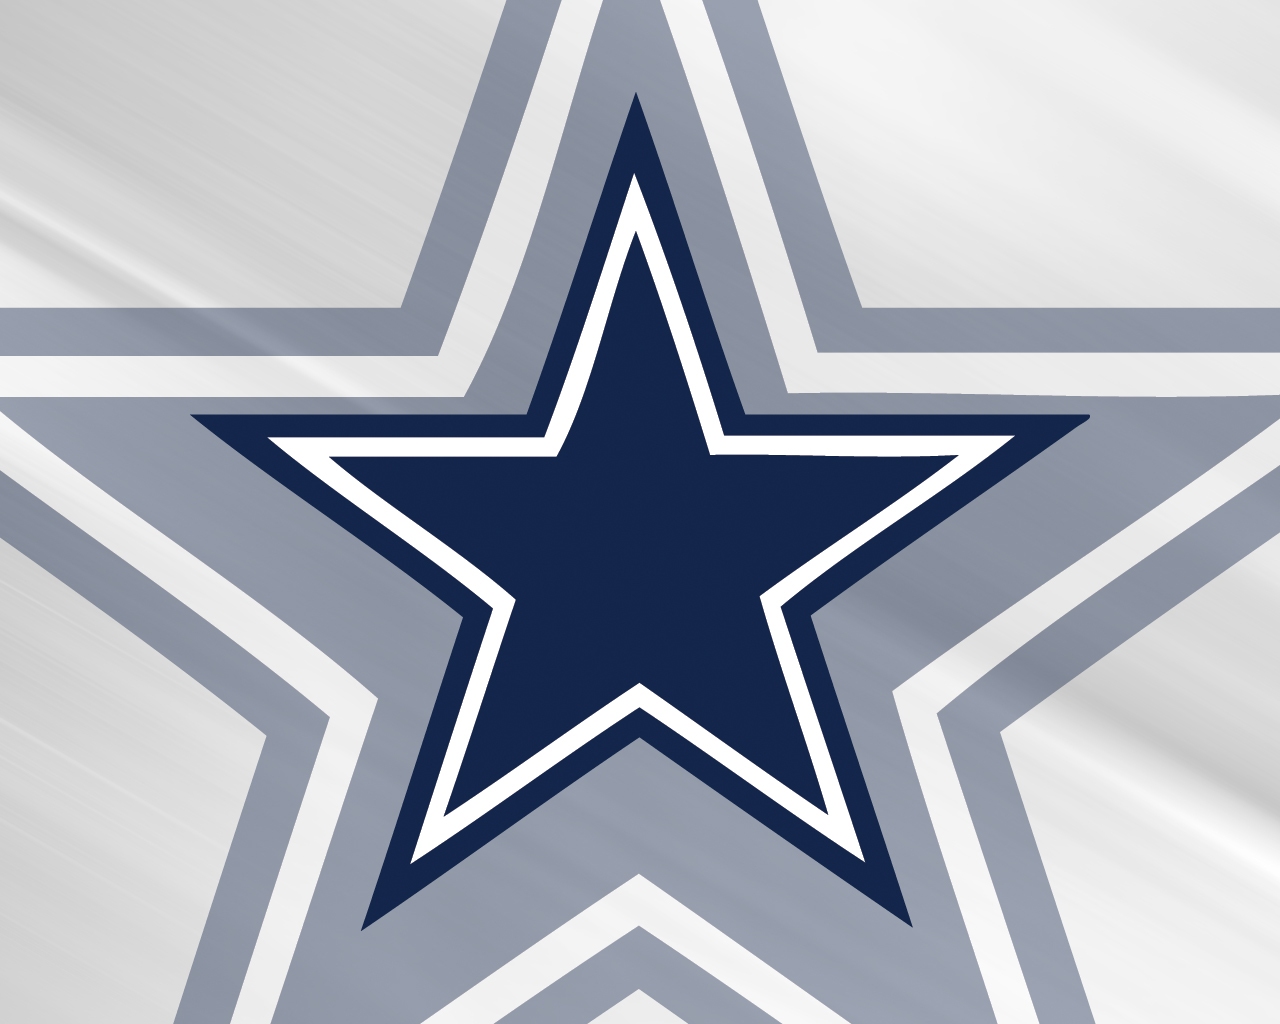 Dallas Cowboys Wallpapers   Desktop Background Wallpapers 1280x1024